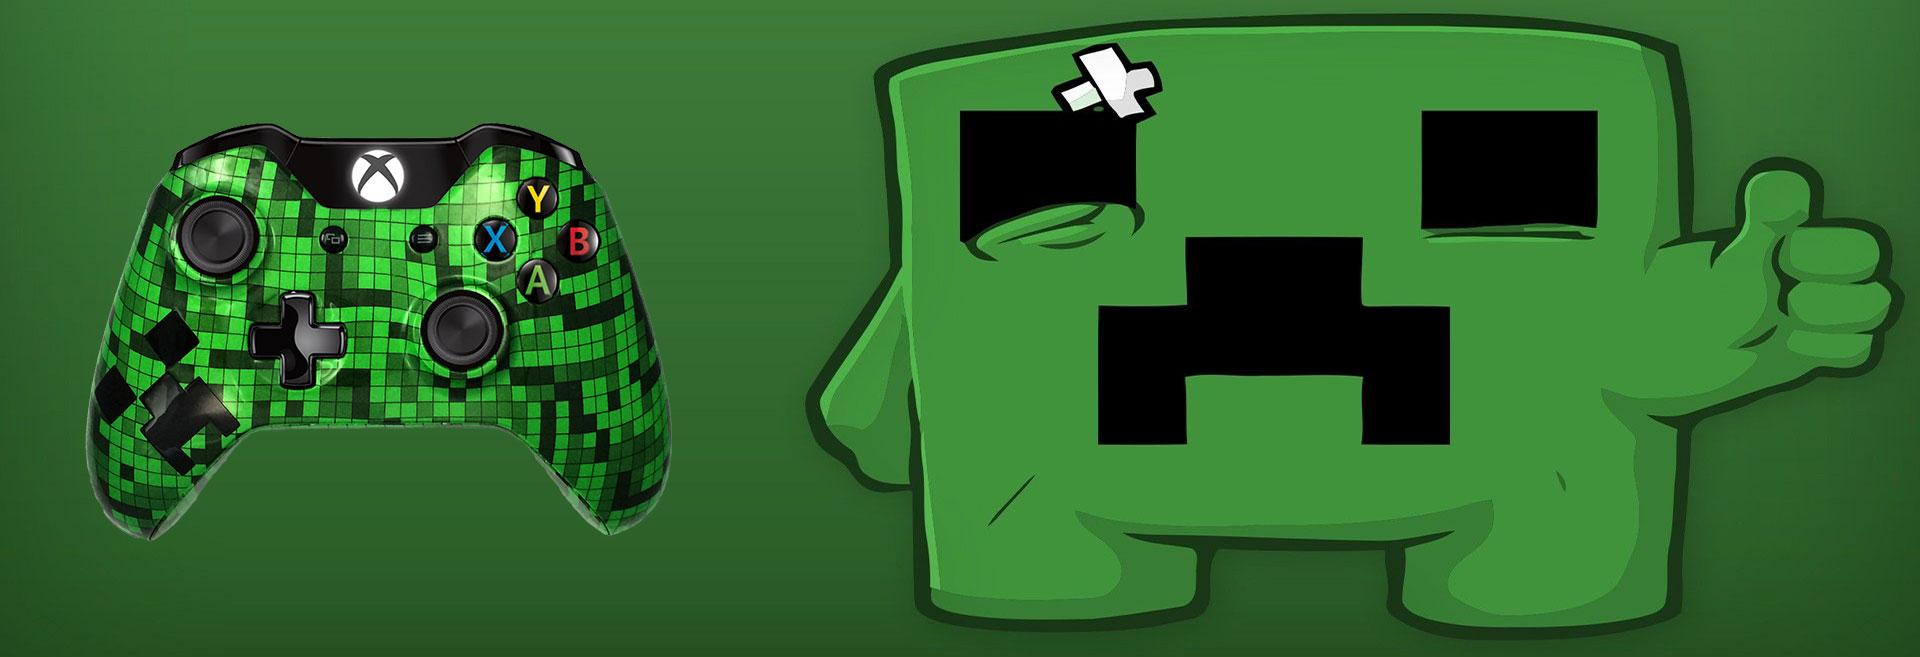 Minecraft Xbox One Controller